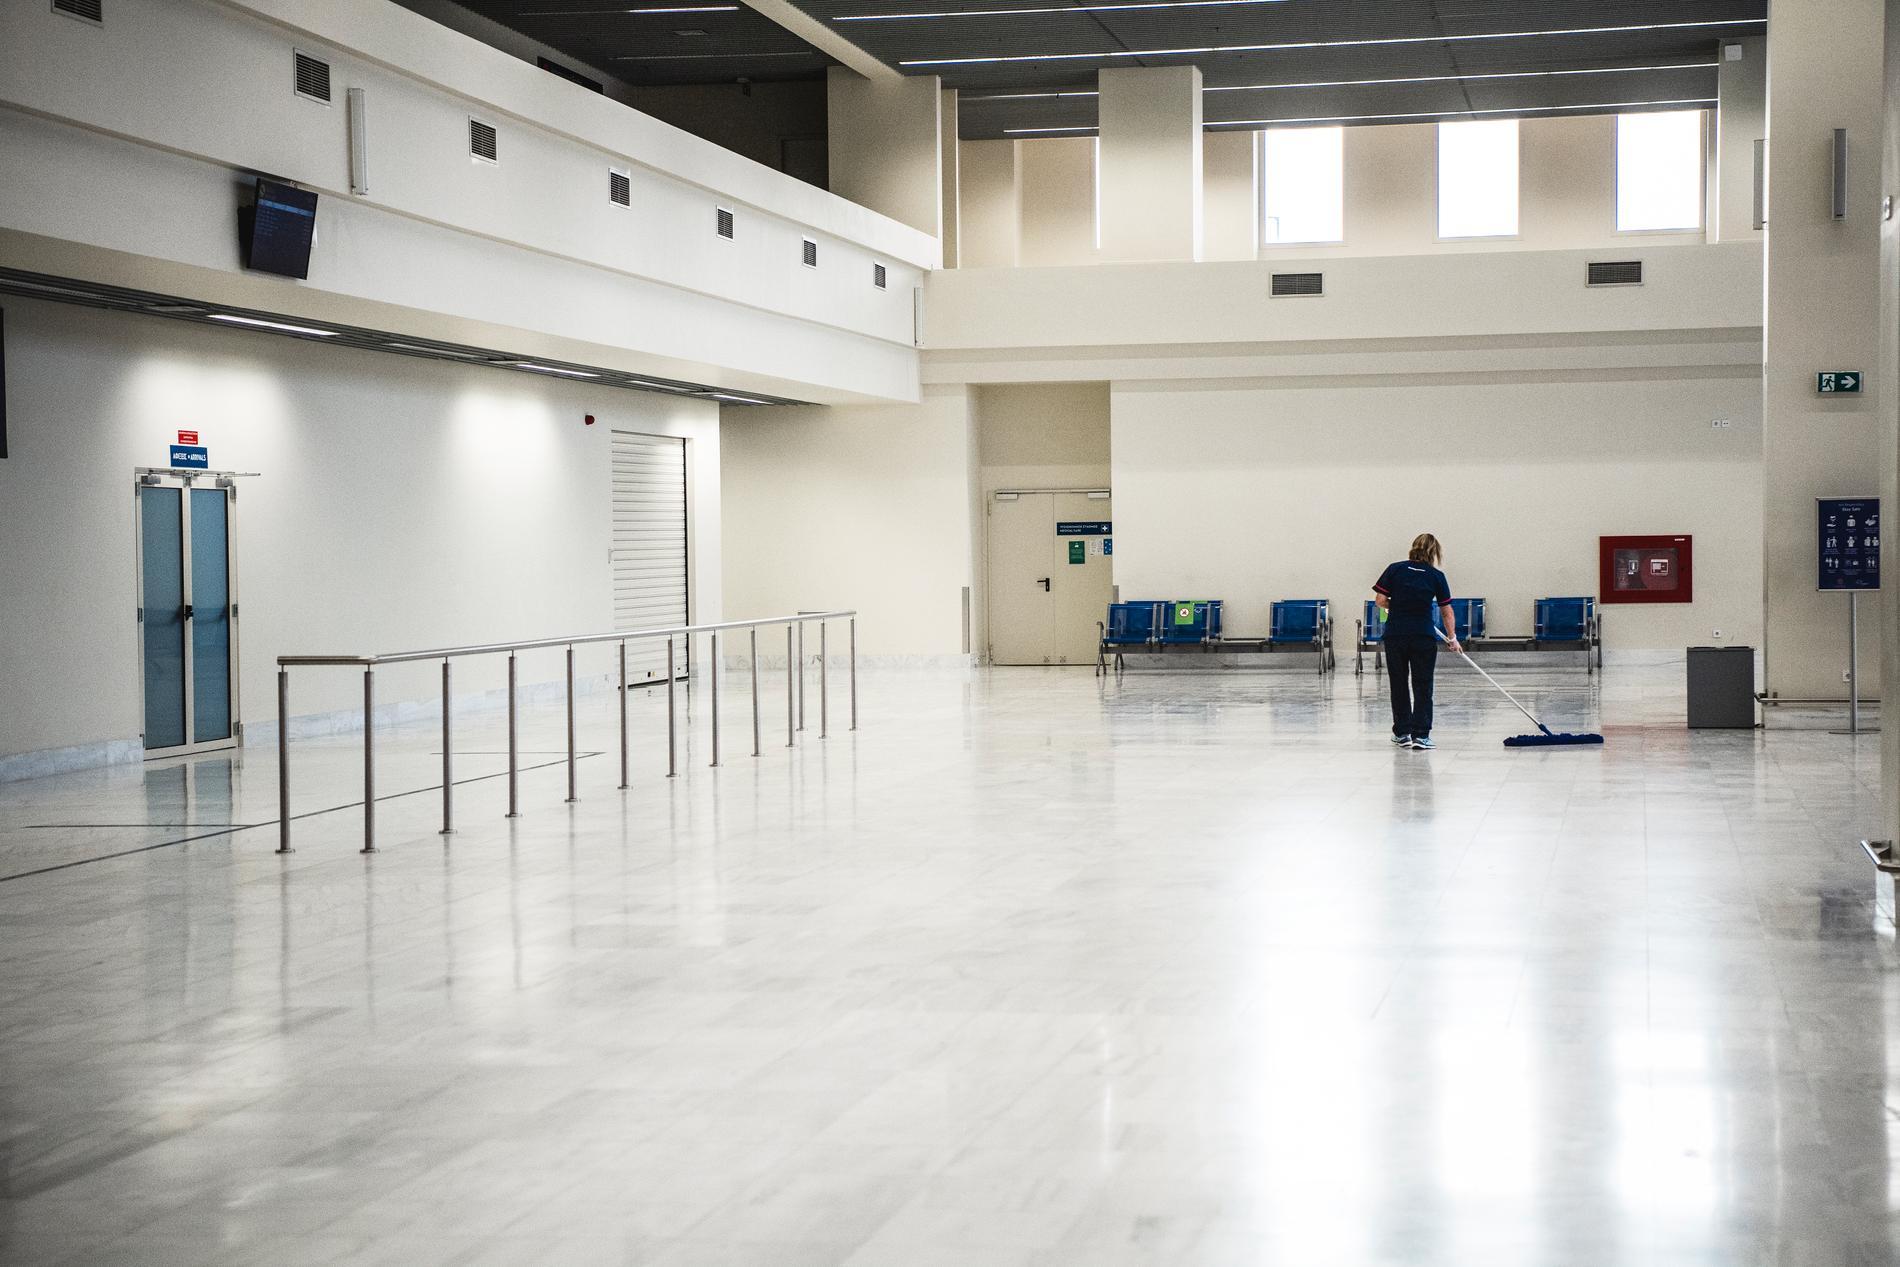 Chania Airport på Kreta